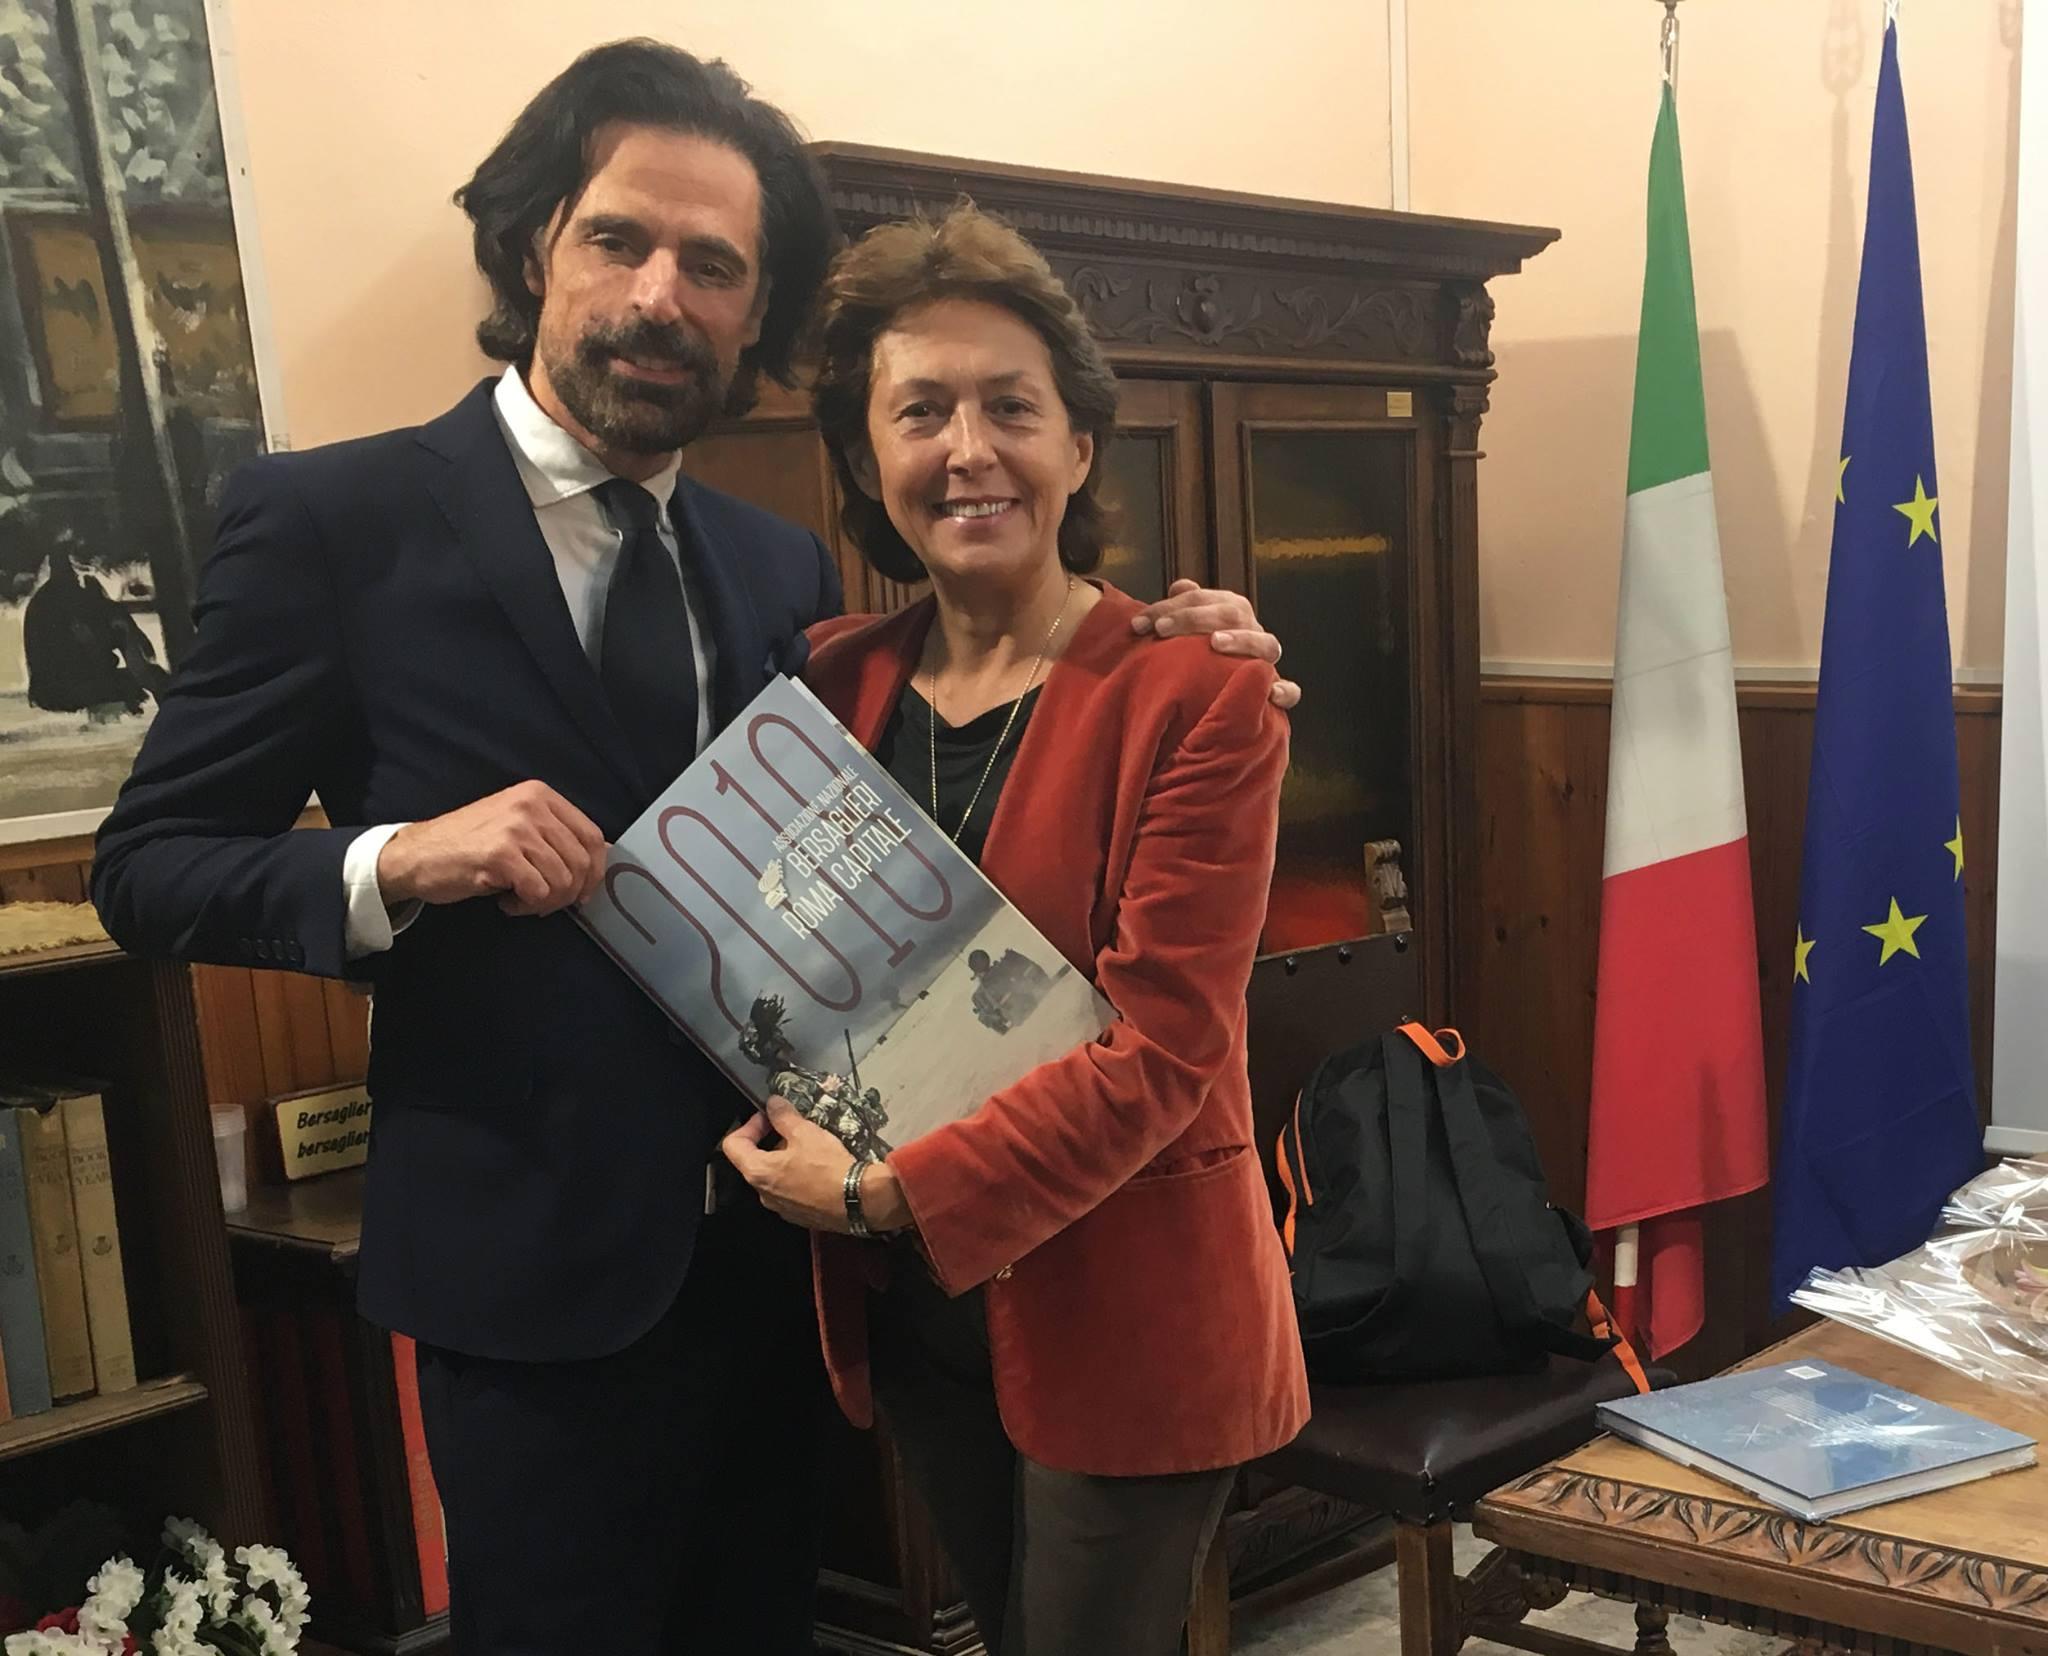 Calendario 2018 Bersaglieri Roma